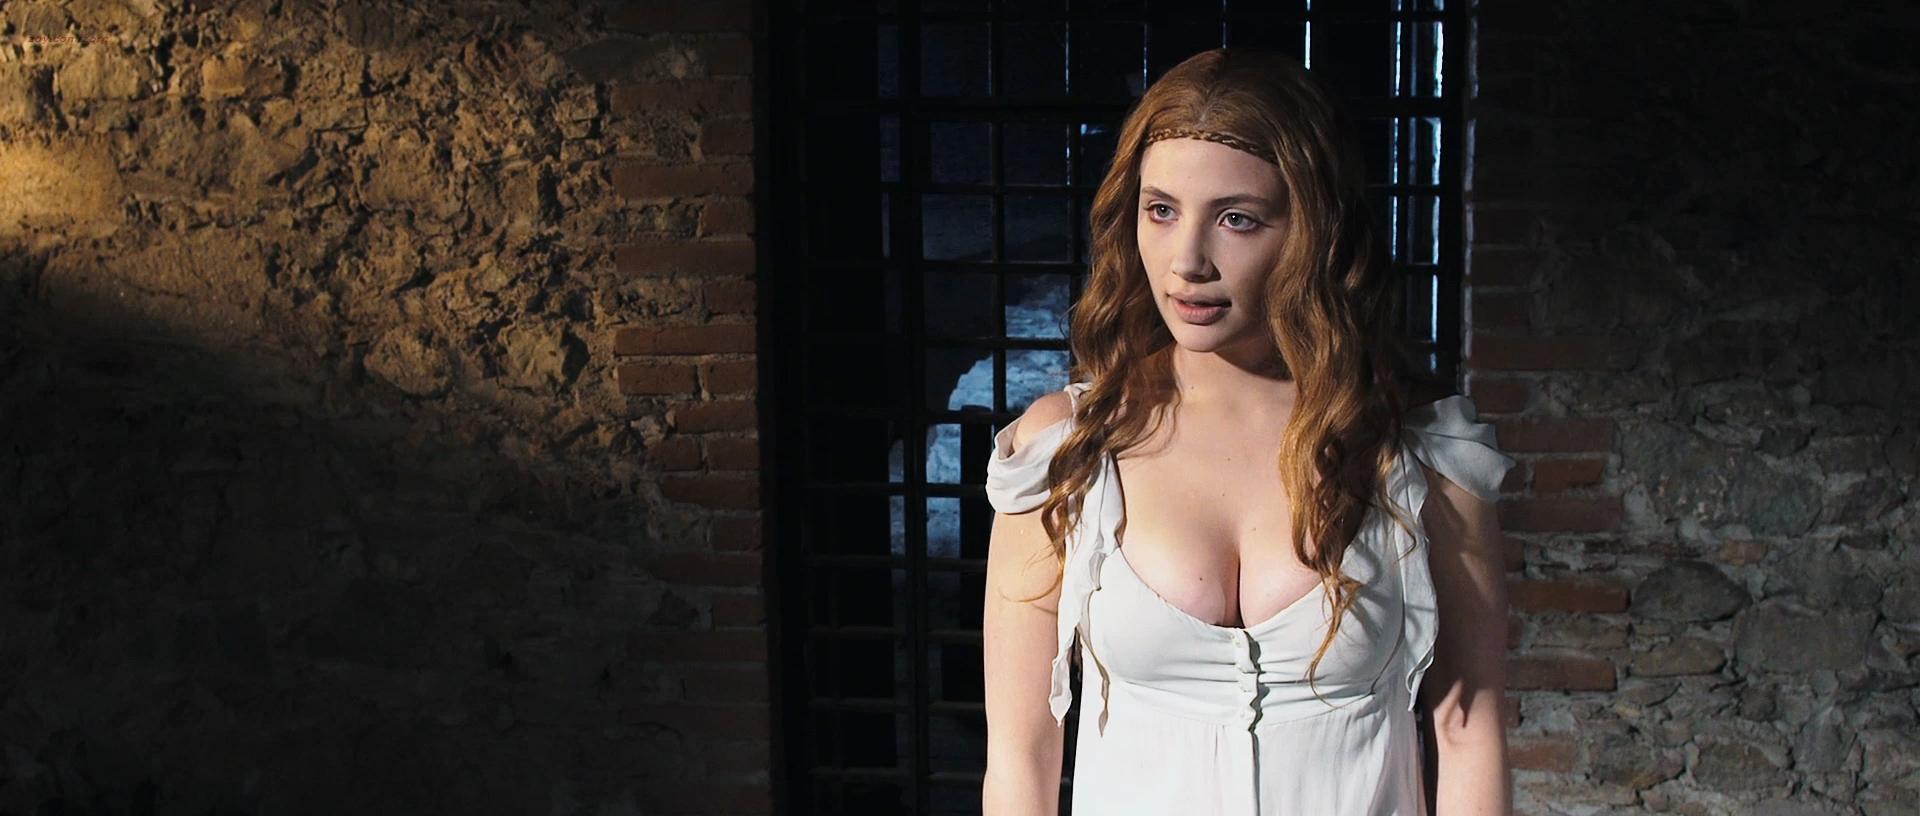 Free womens erotica video